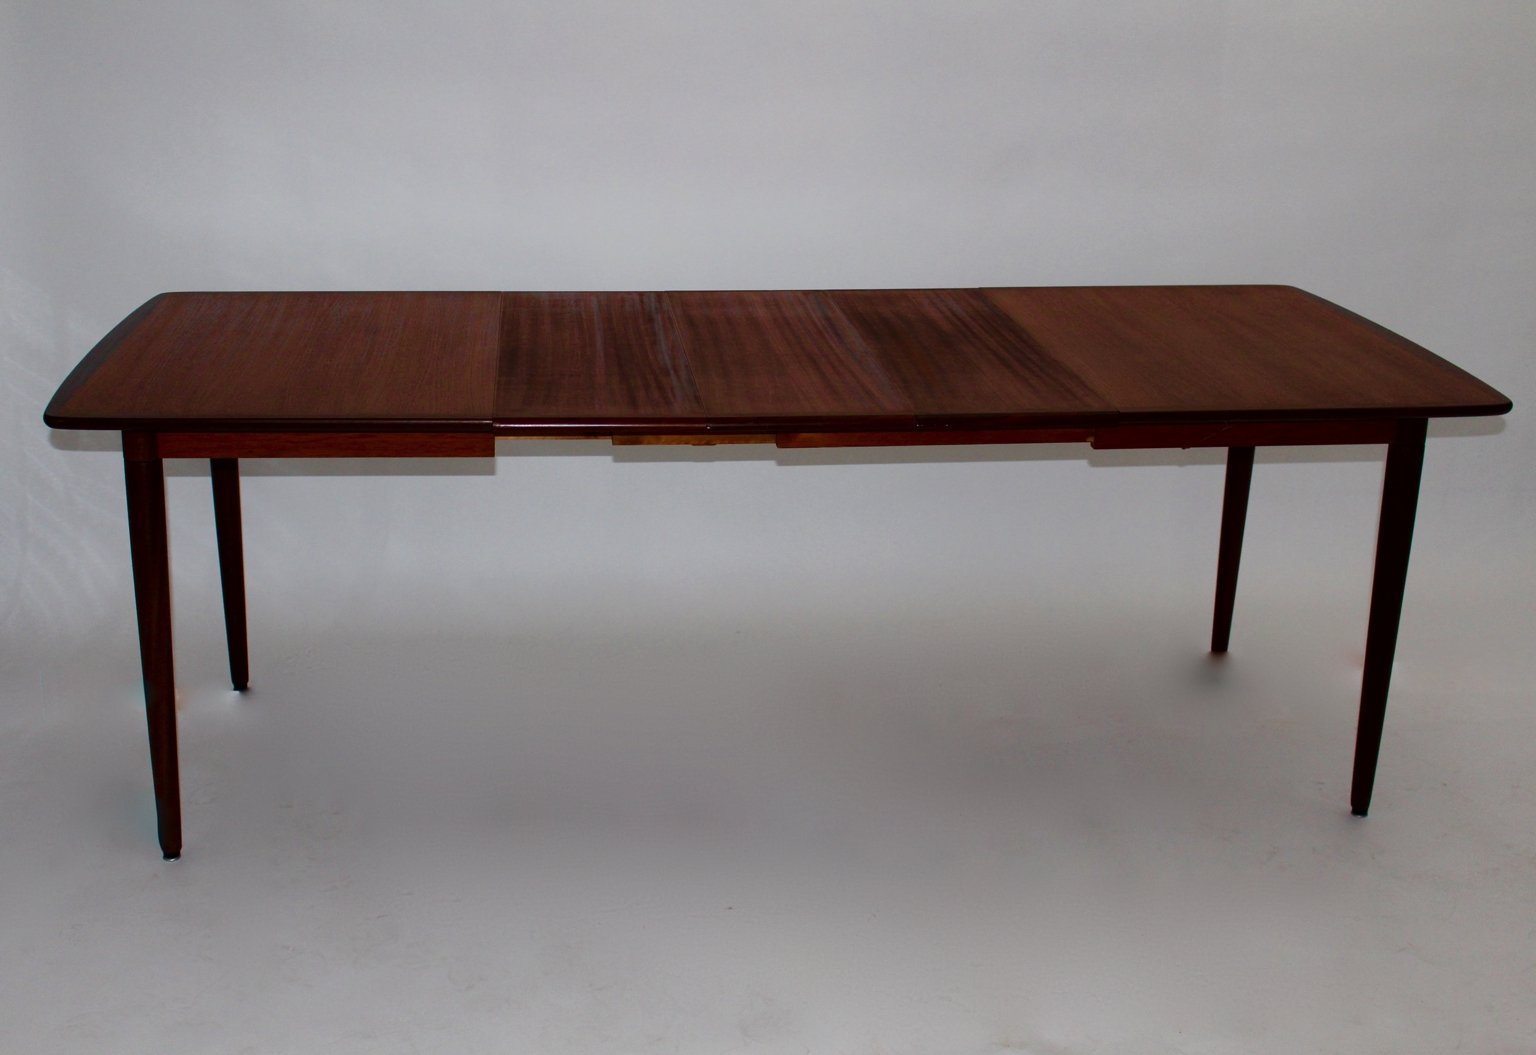 Table de salle manger rectangulaire en teck palissandre for Salle a manger en teck